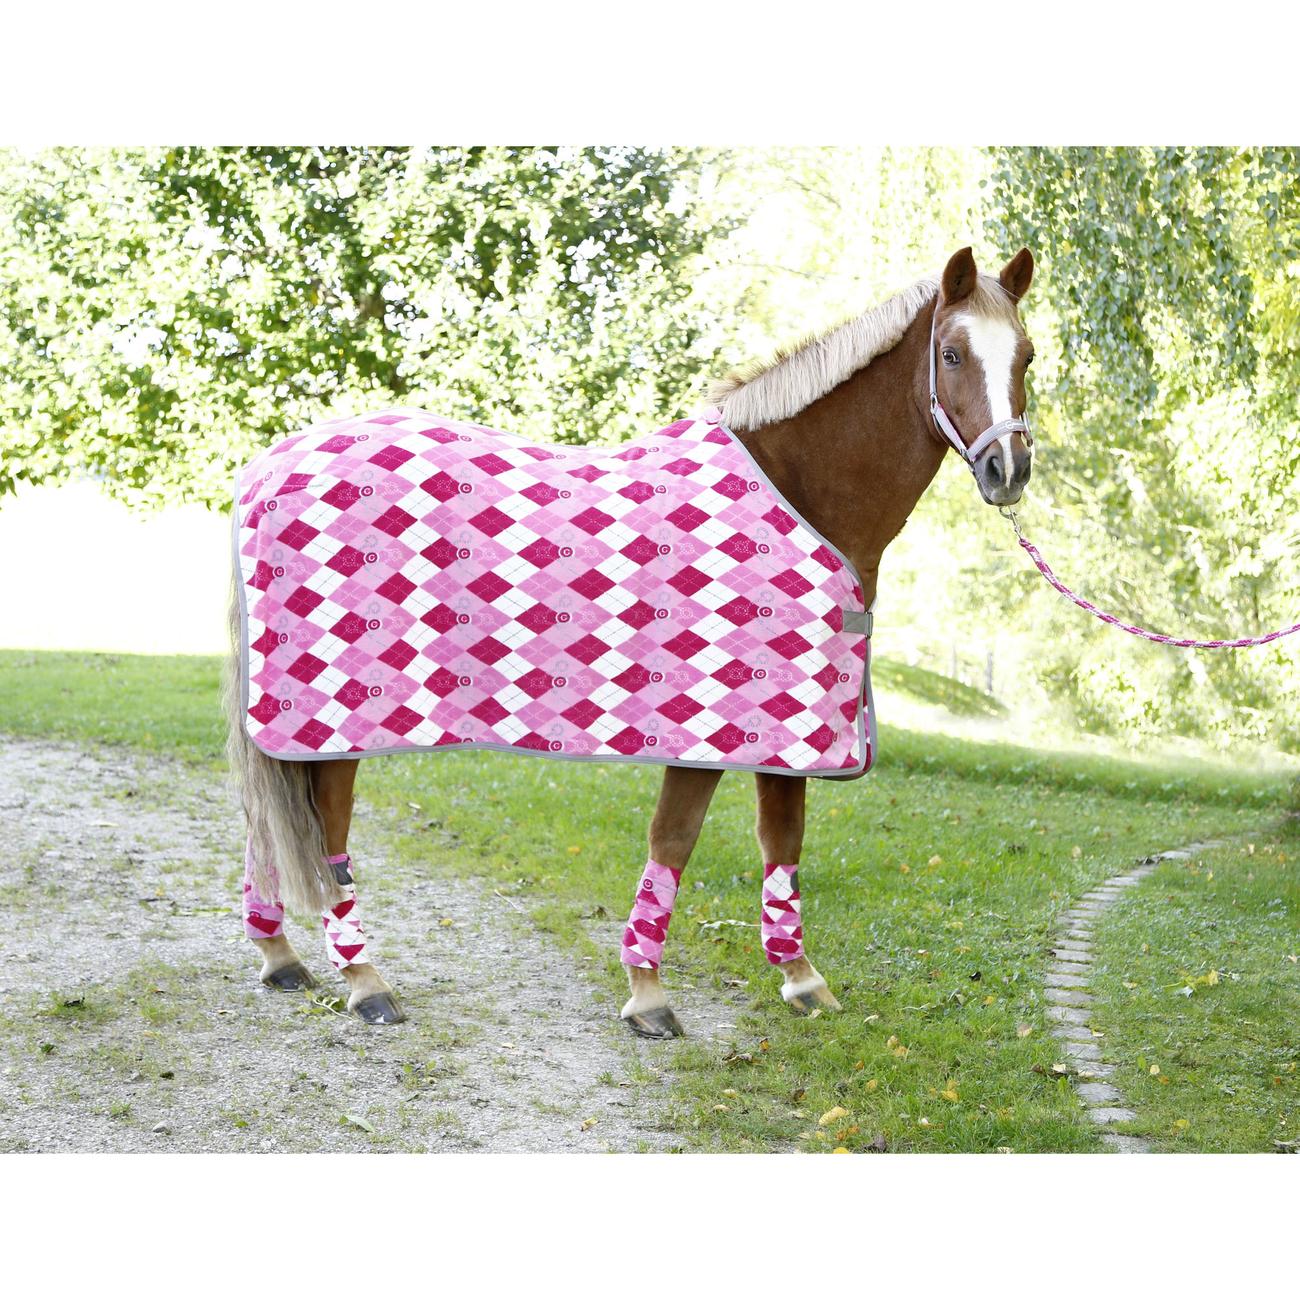 Covalliero RugBe Pony Pferdedecke Fleecedecke Lilli, Bild 3